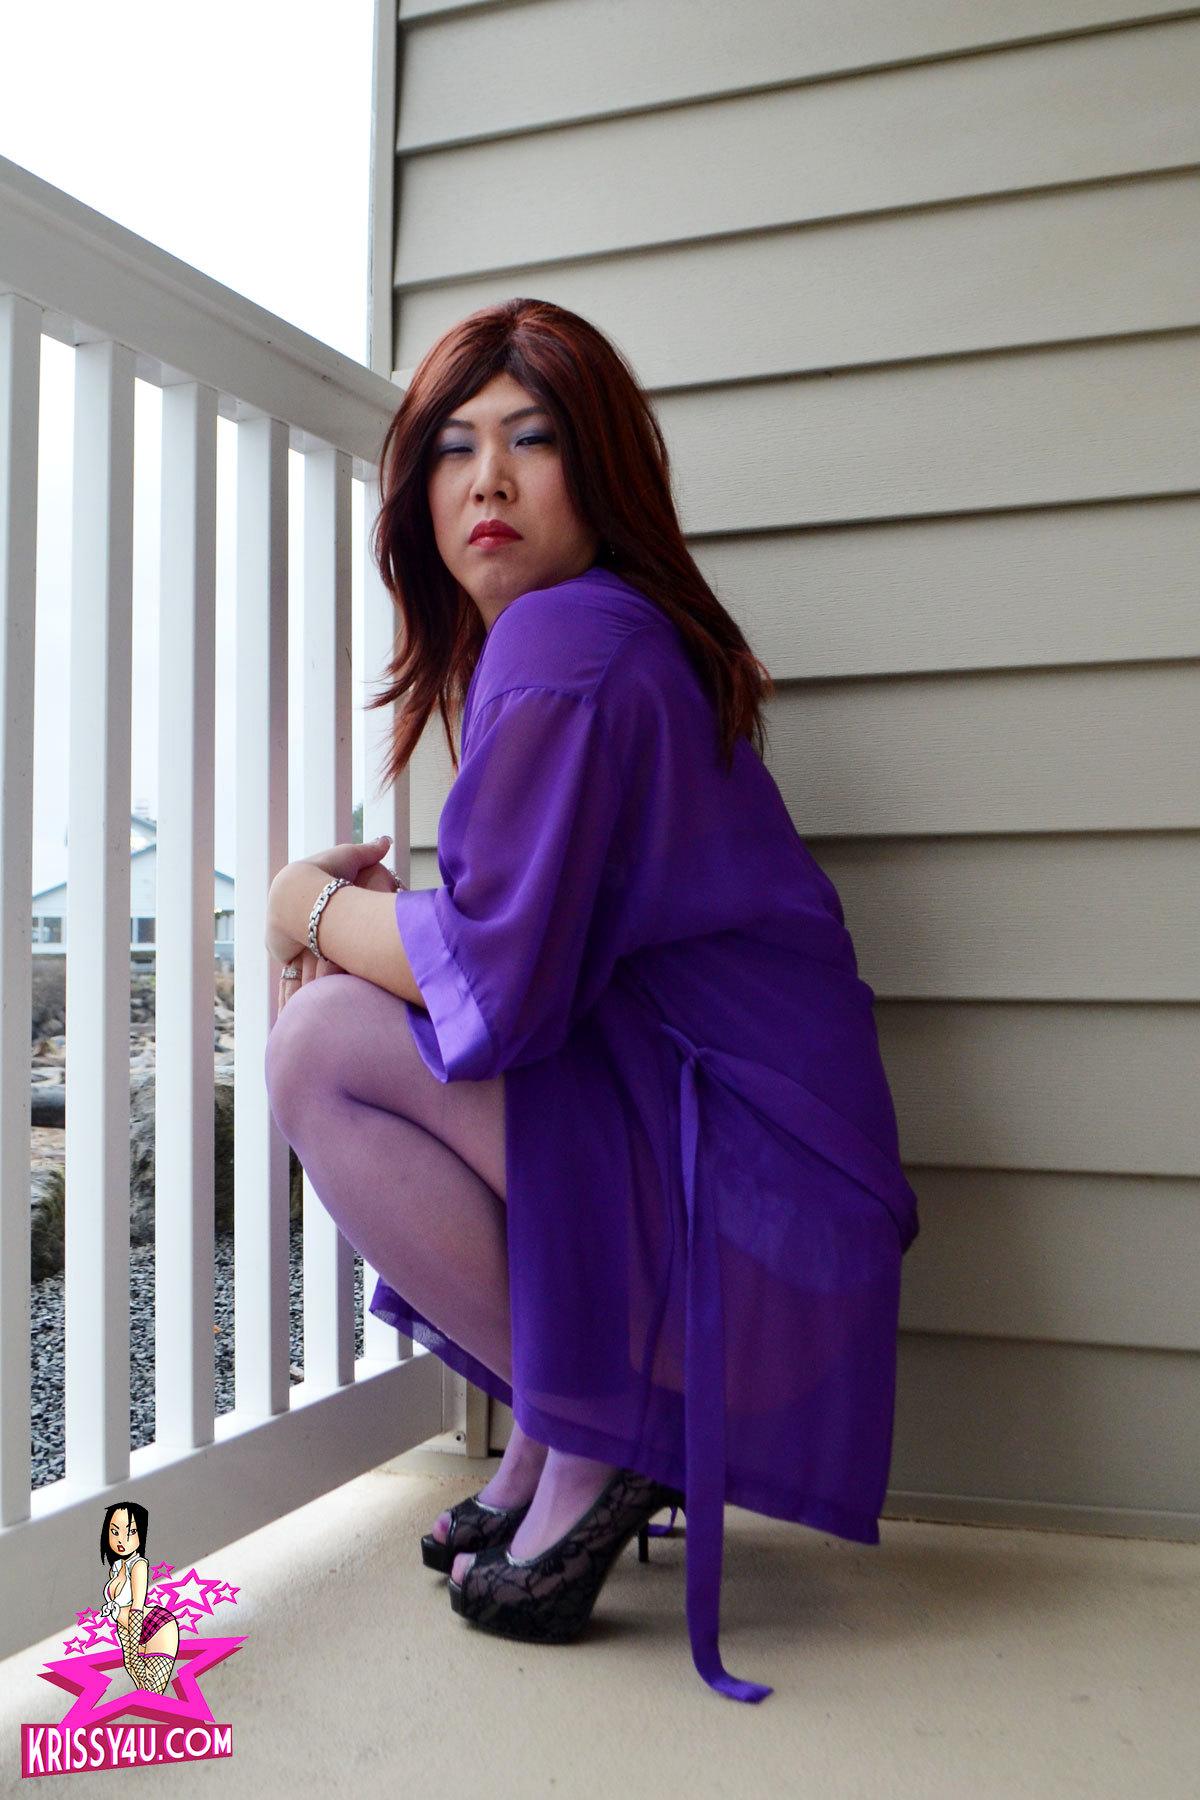 Krissy Kyung In Purple Undies On The Balcony